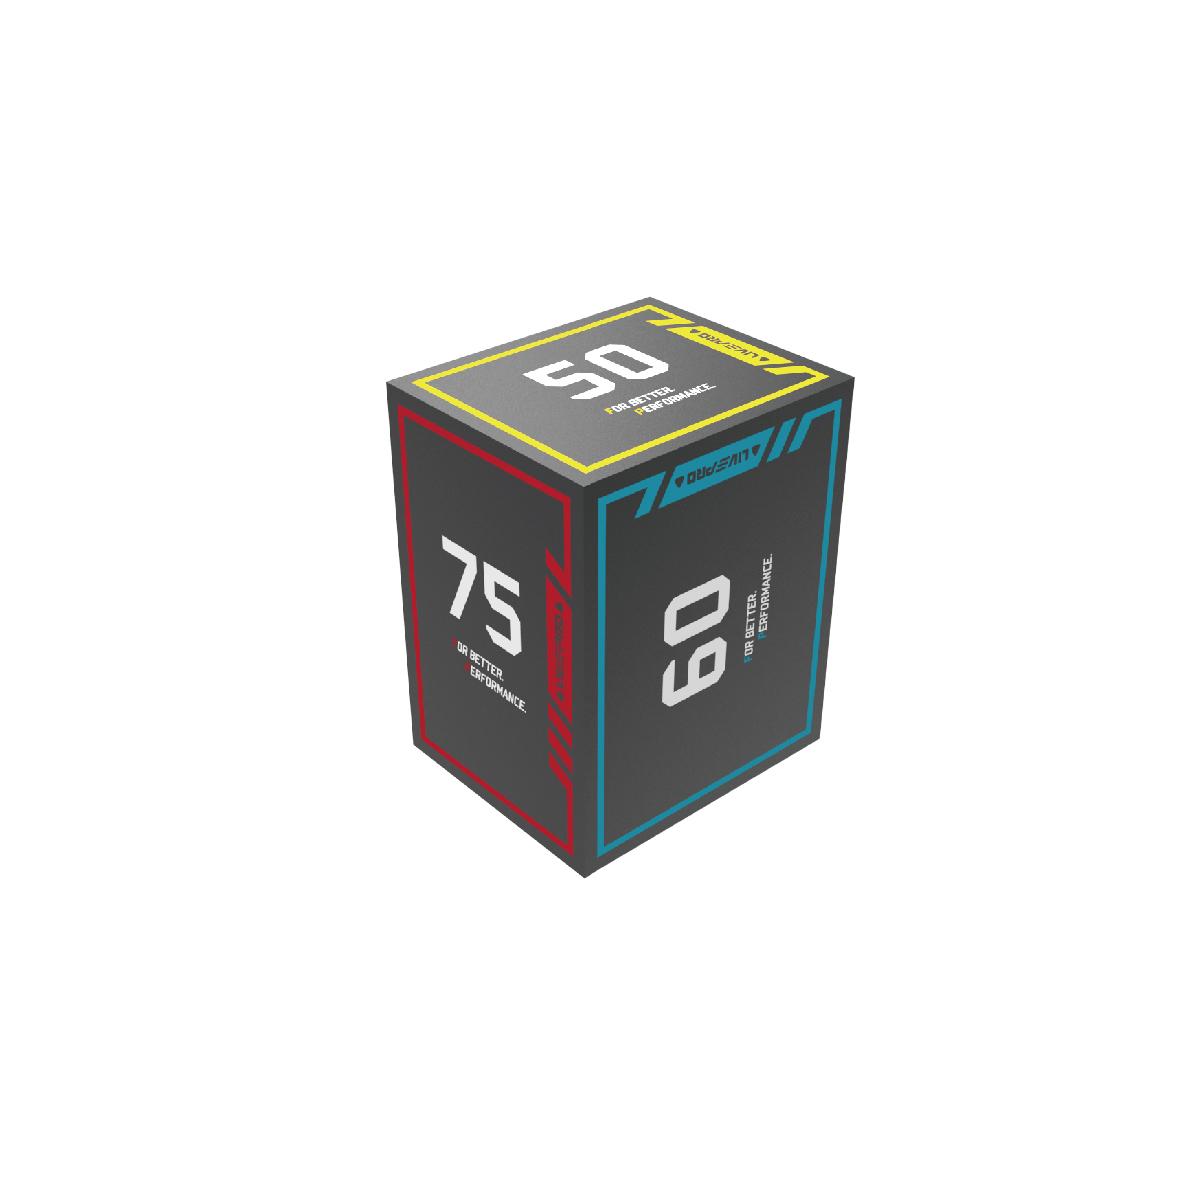 3IN-1 PRO-DUTY SOFT PLYOMETRIC BOX